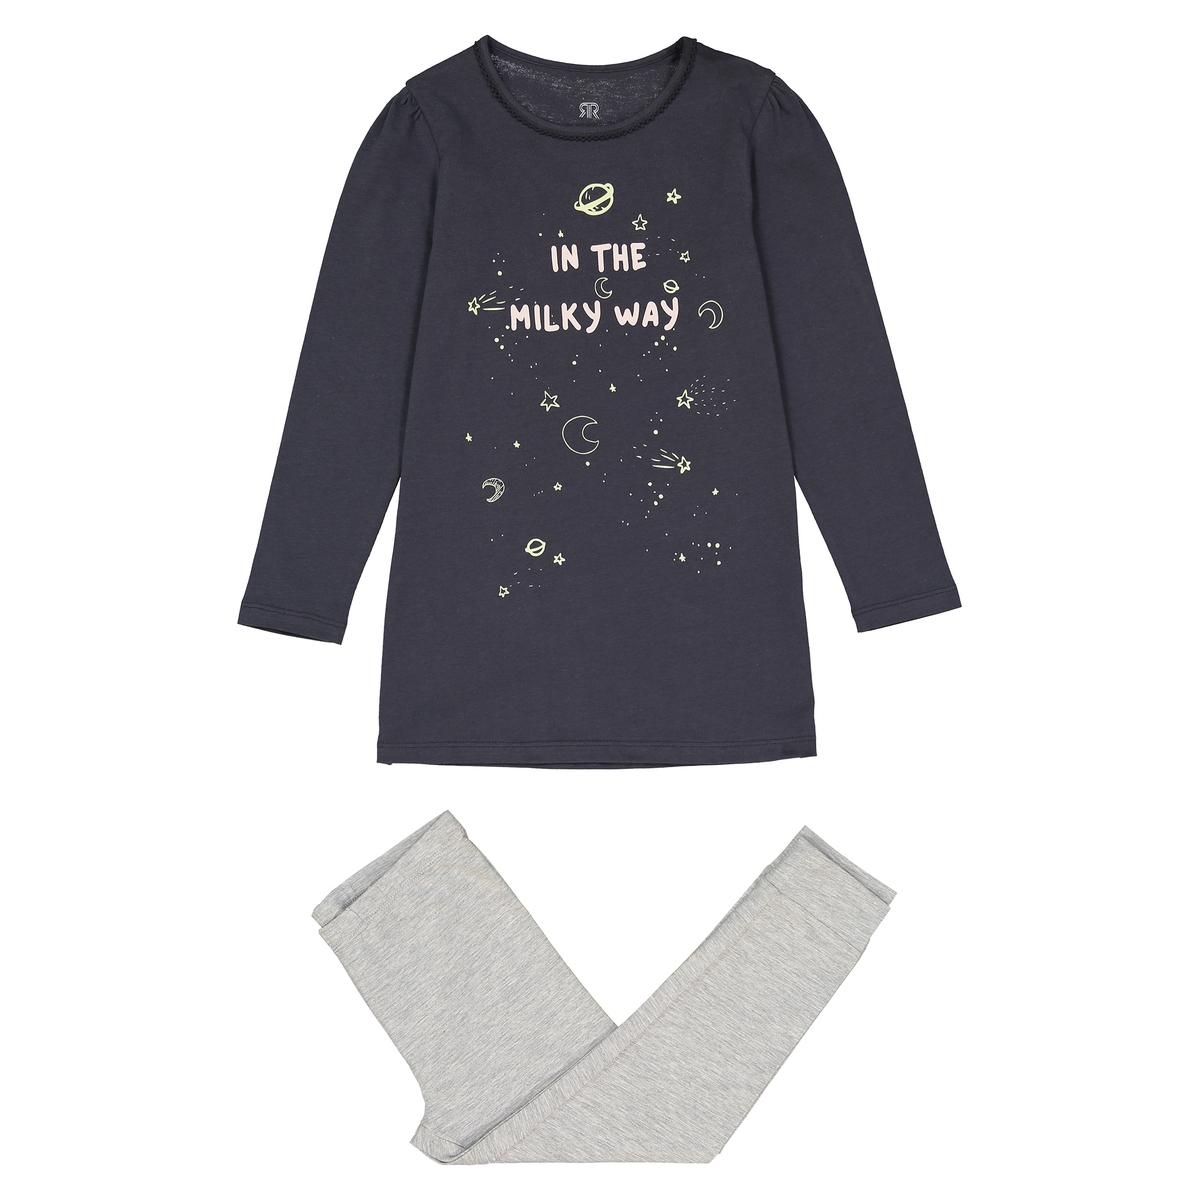 Пижама с фосфоресцирующим рисунком, 3-12 лет